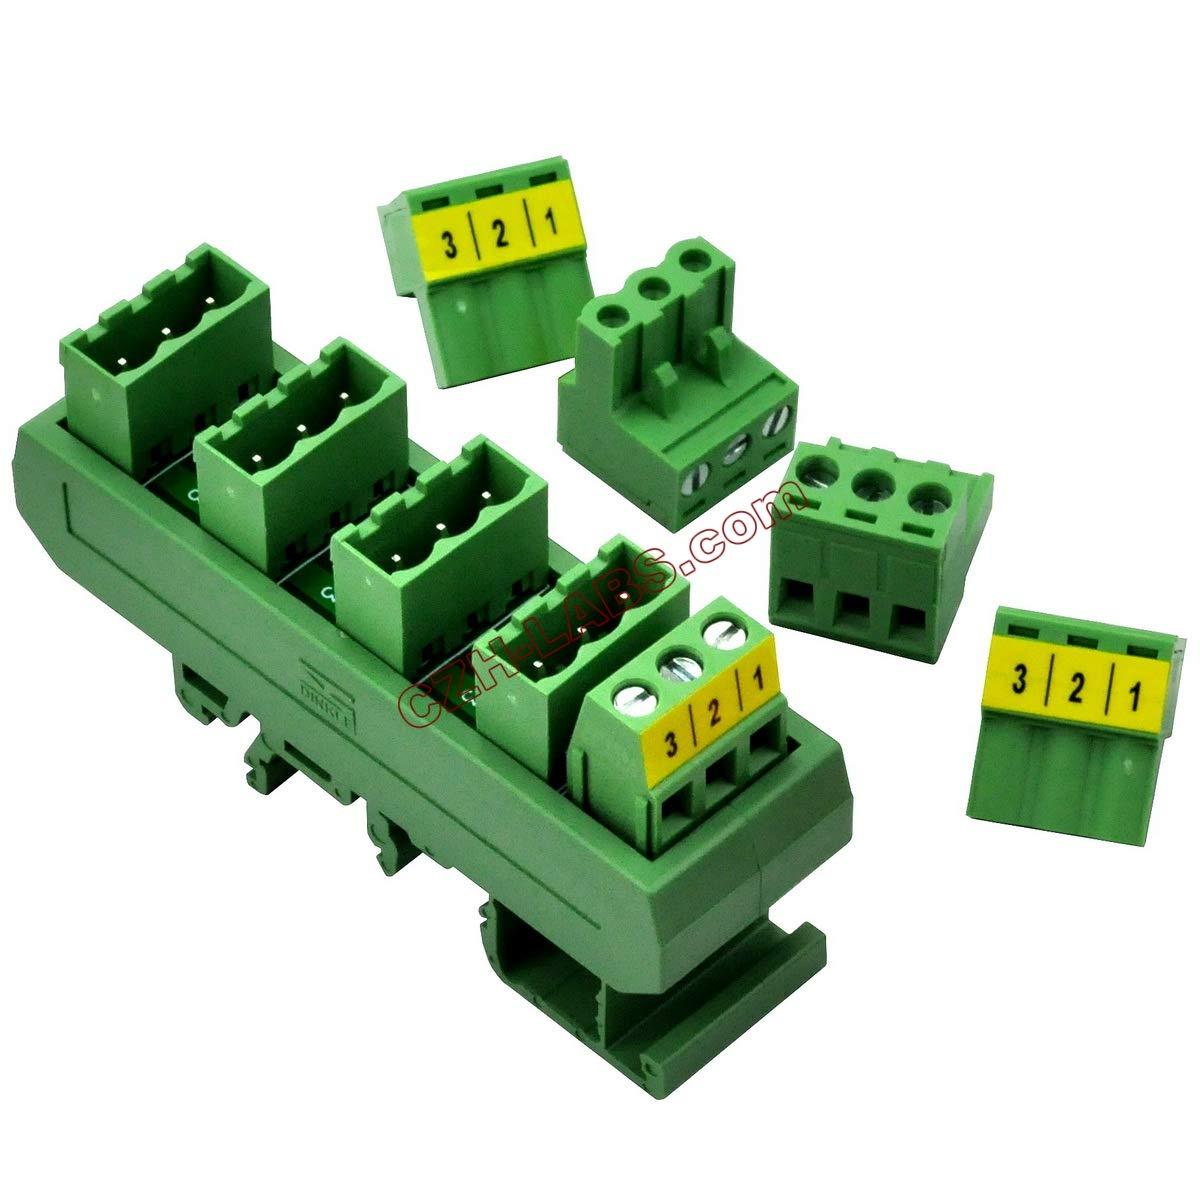 Electronics-Salon Slim DIN Rail Mount 10A/300V 5x3 Position Pluggable Screw Terminal Block Distribution Module.